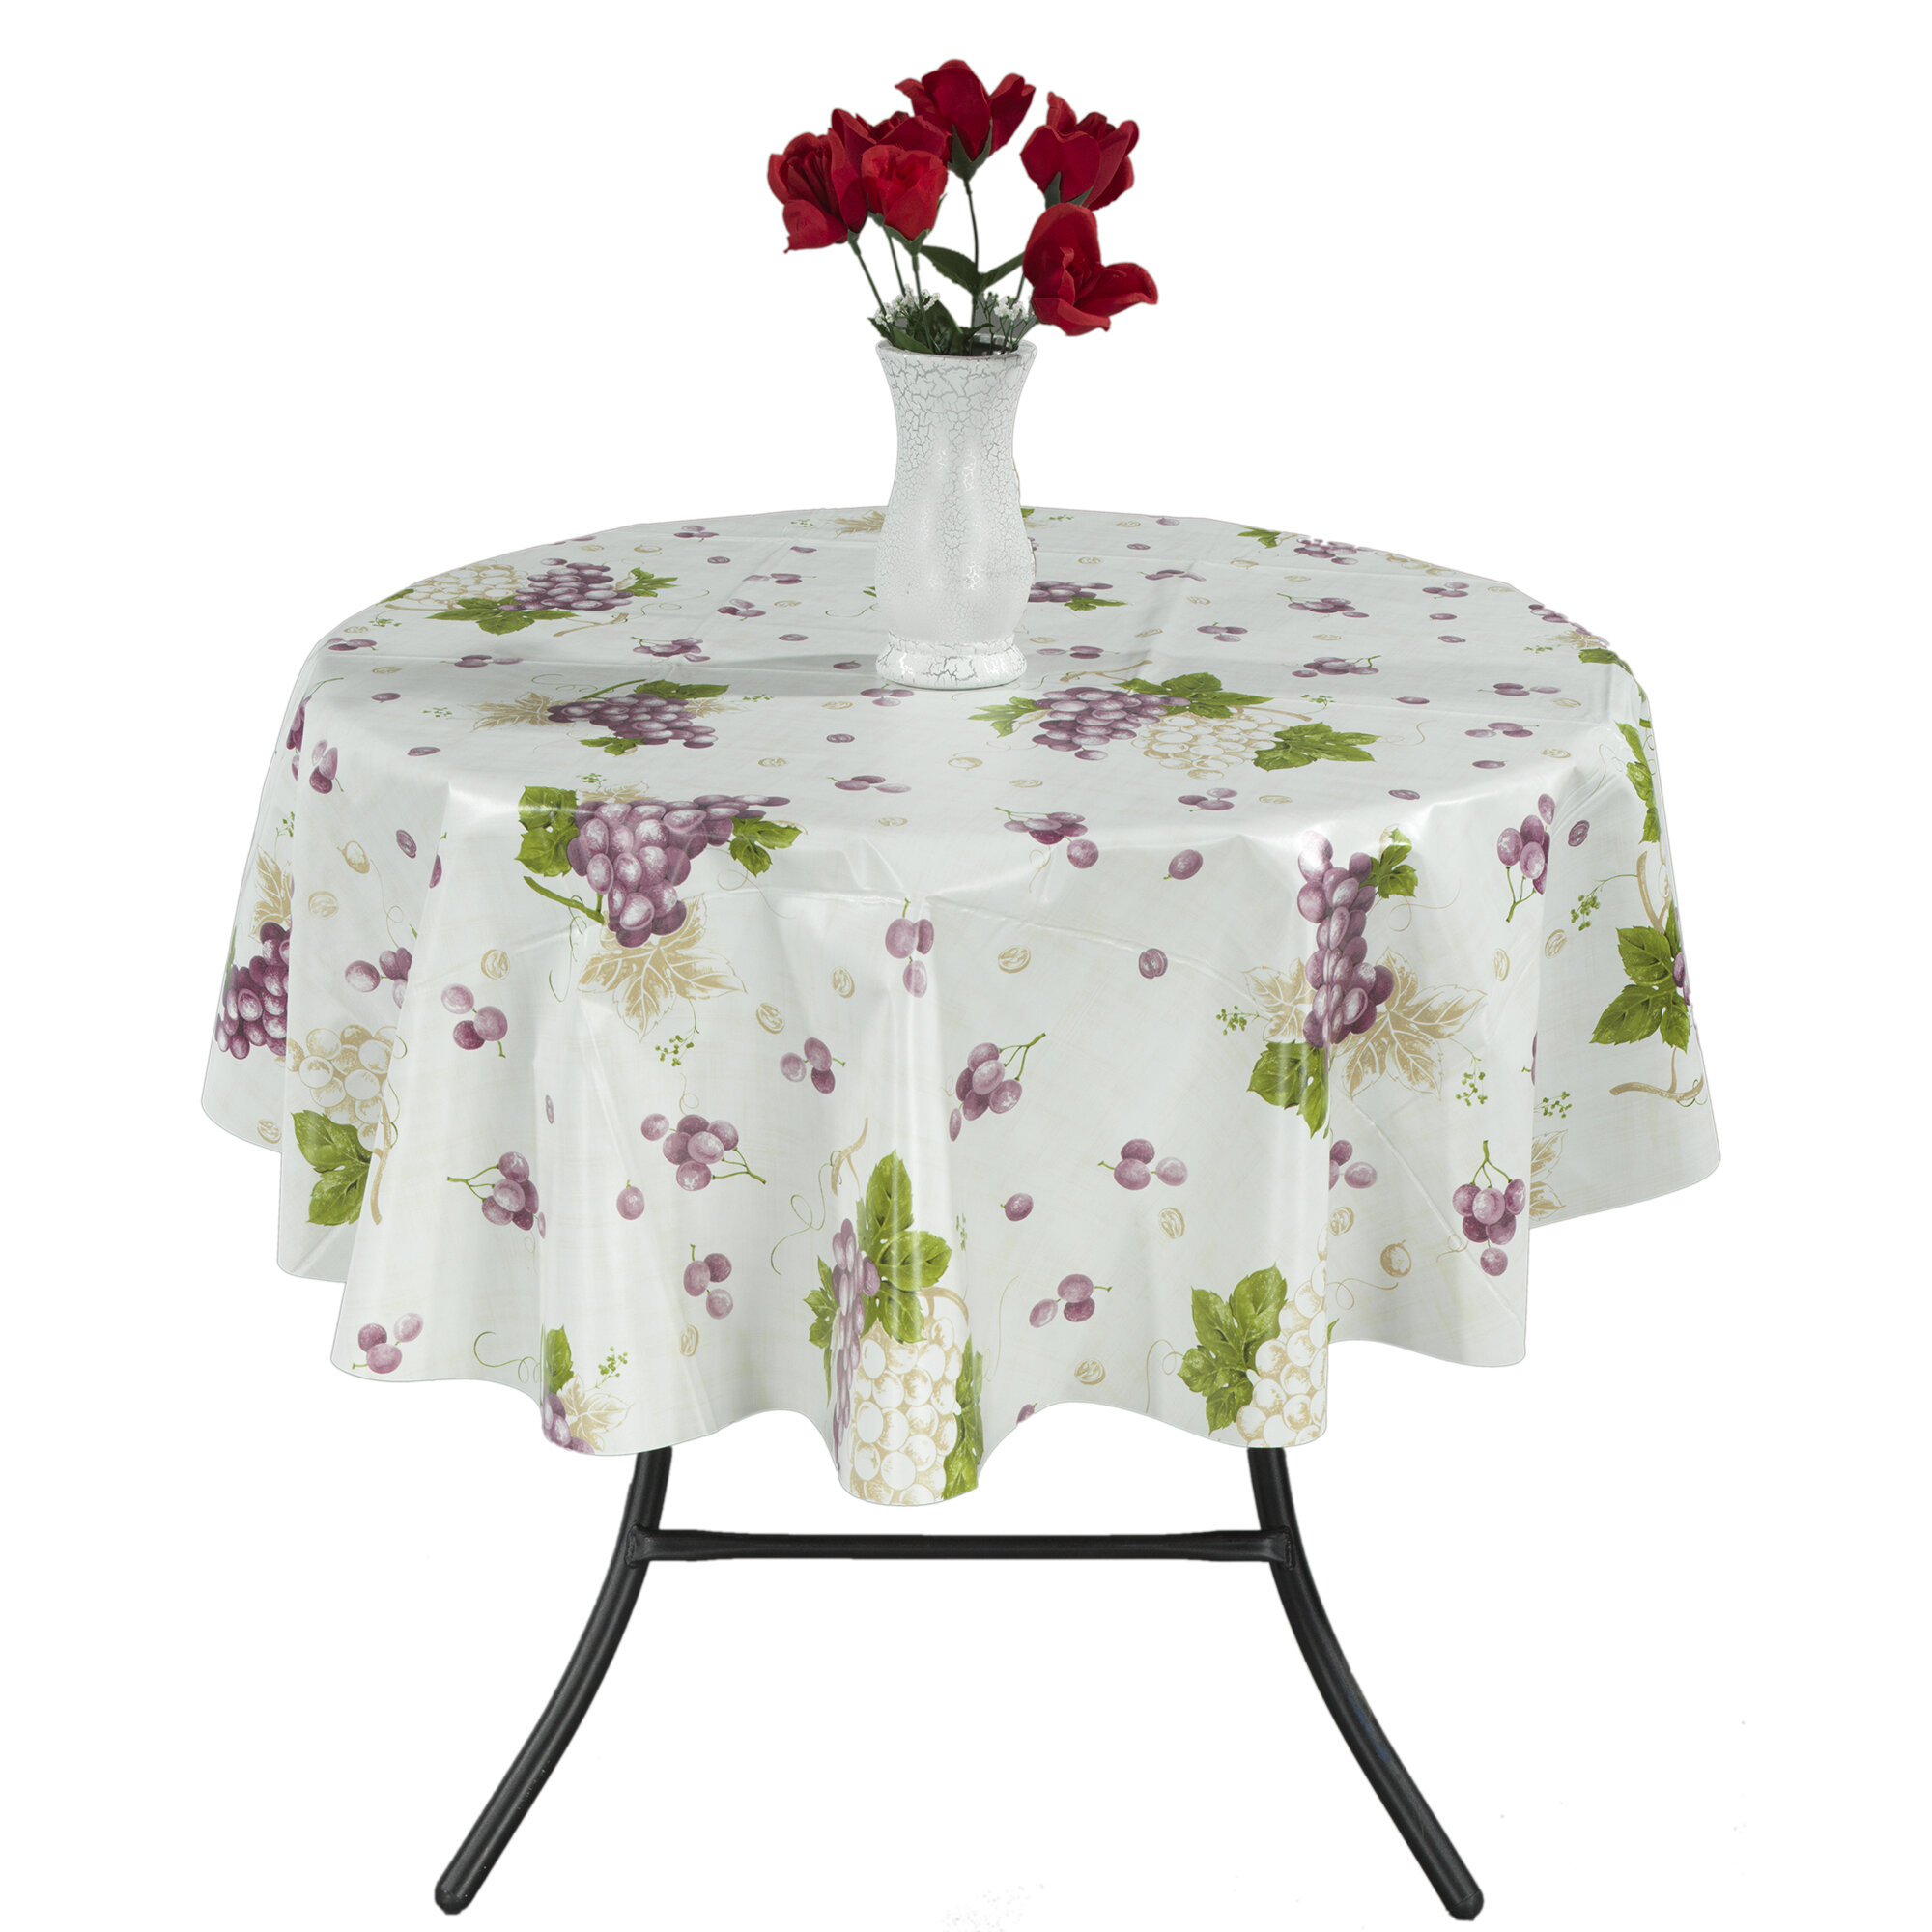 Berrnour Home Grape Vine Vinyl Indoor/Outdoor Tablecloth & Reviews ...